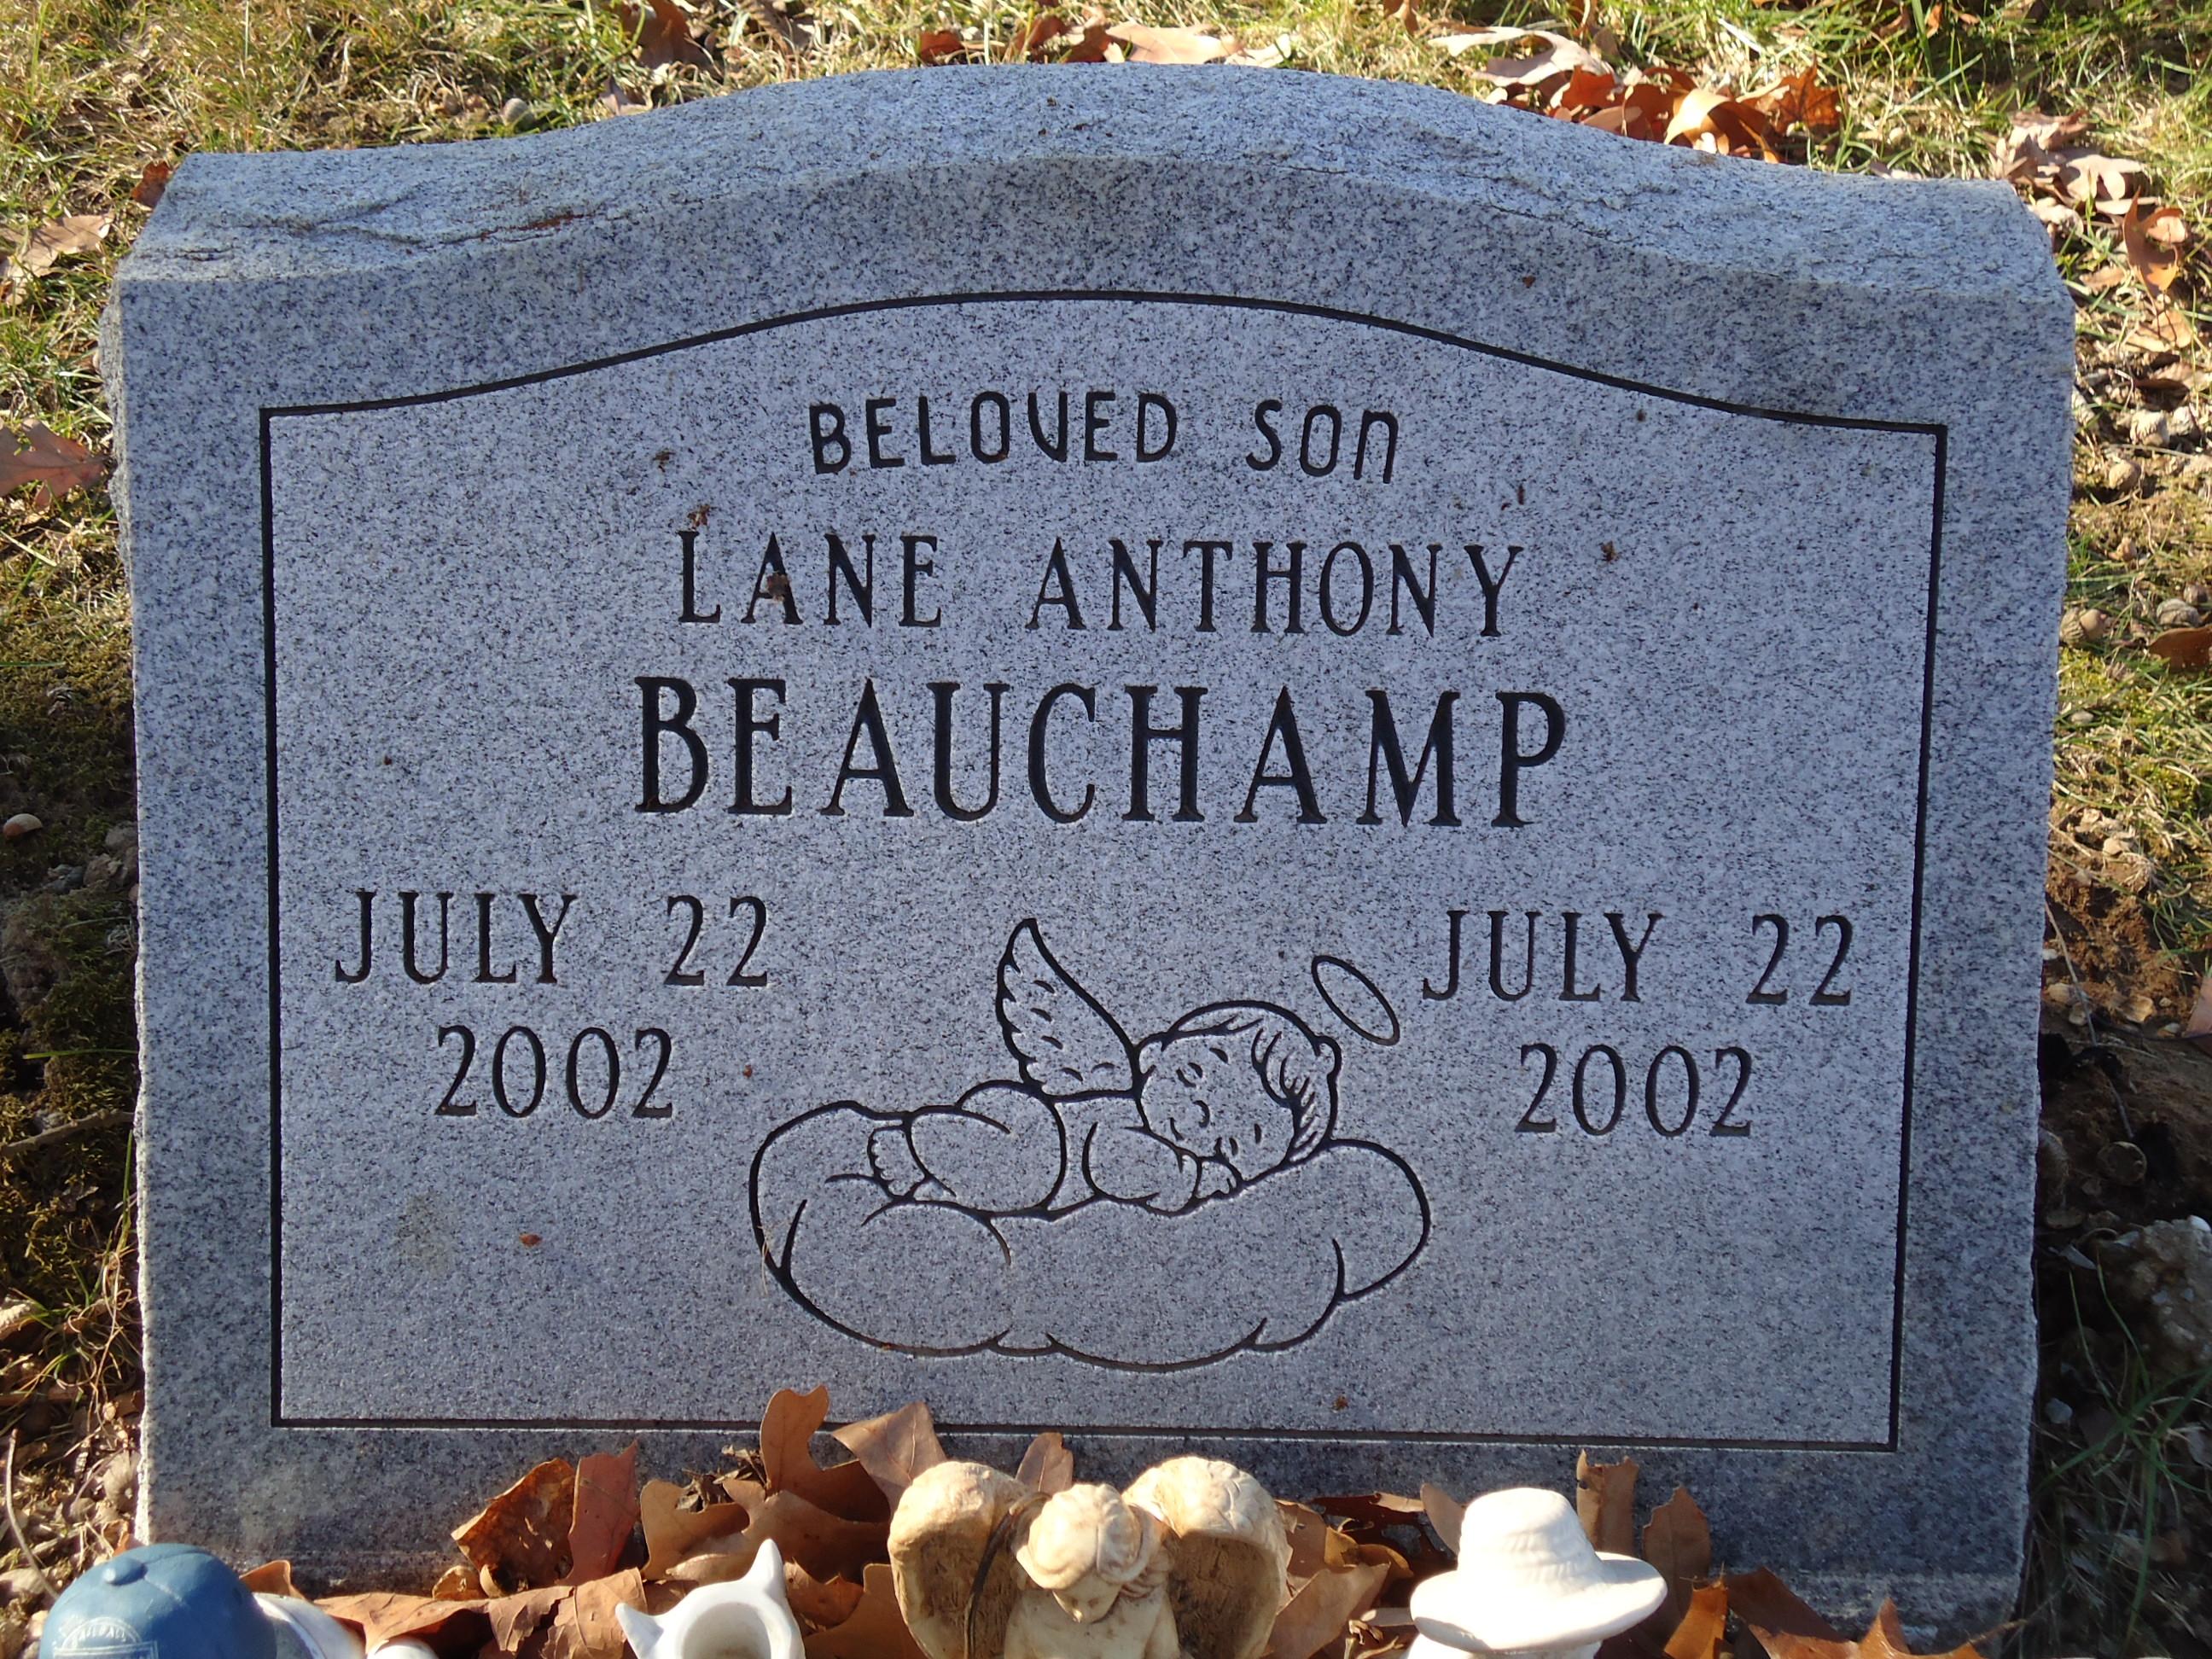 Lane Anthony Beachamp